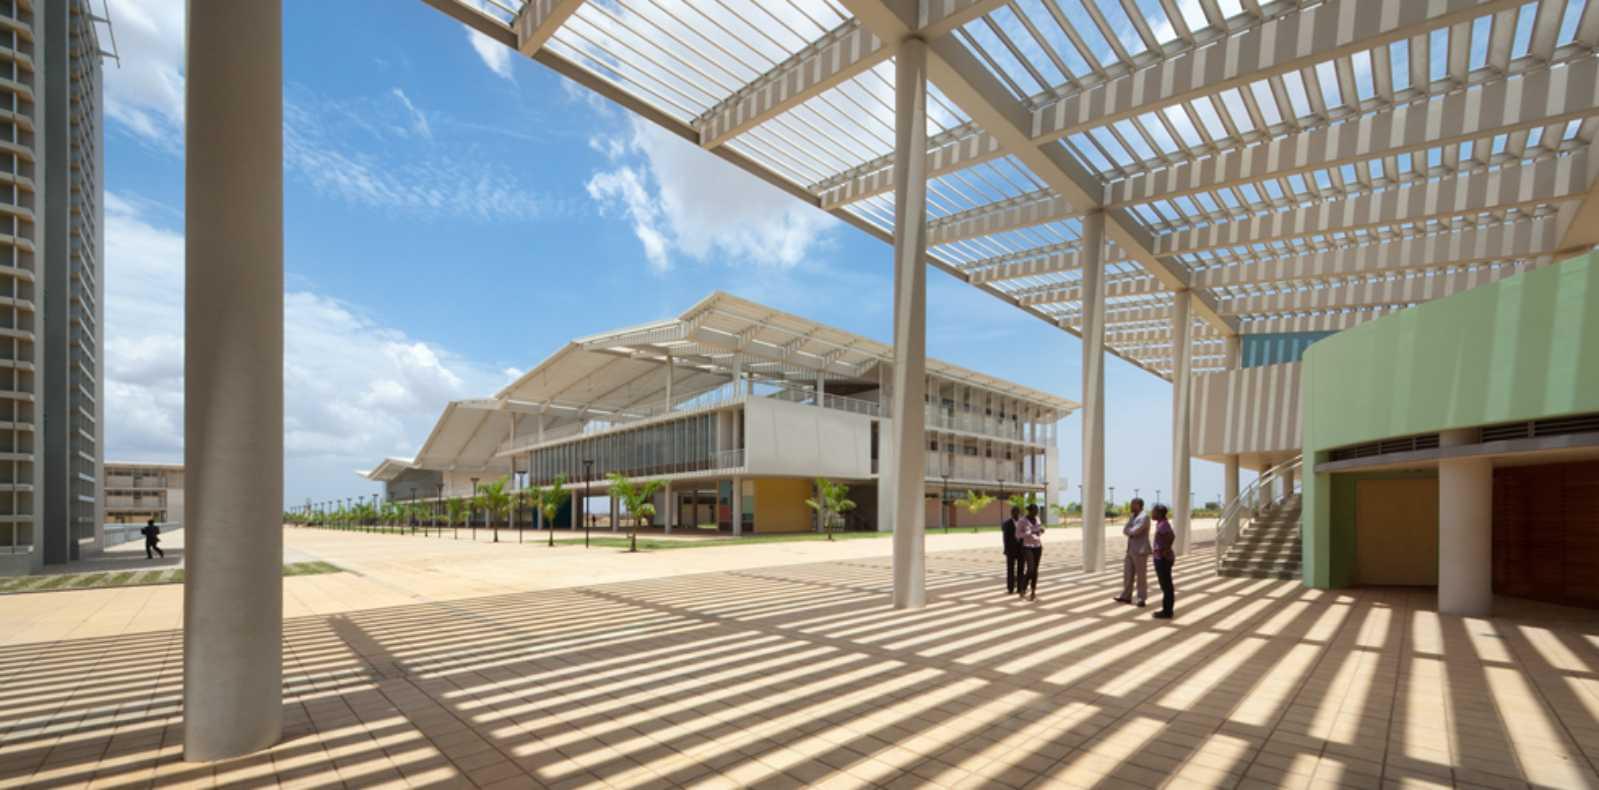 Universidade-Agostinho-Neto-by-Perkins-Will-12.jpg